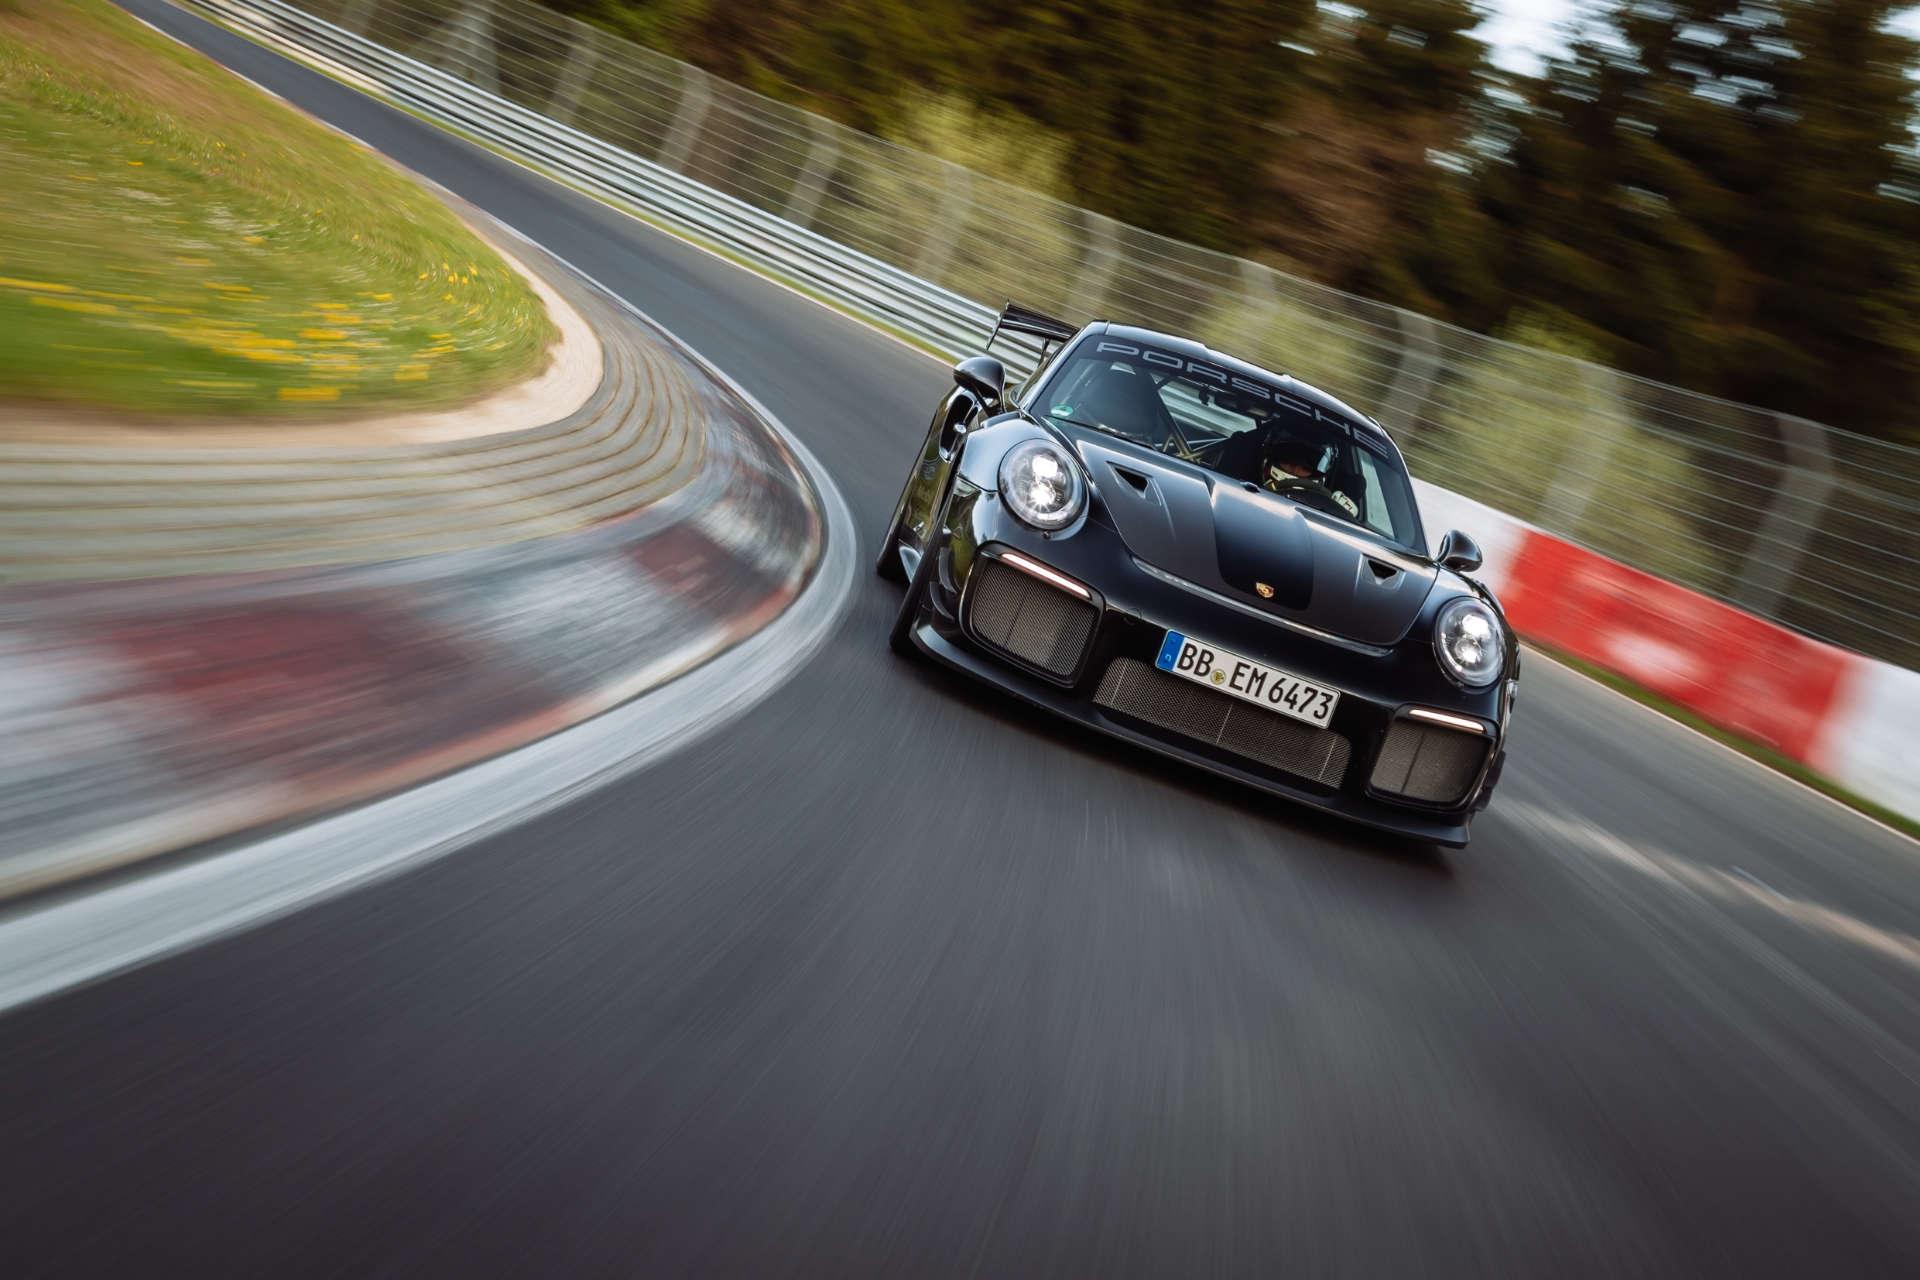 Porsche 911 GT2 RS Rekordfahrt Nürburgring Front